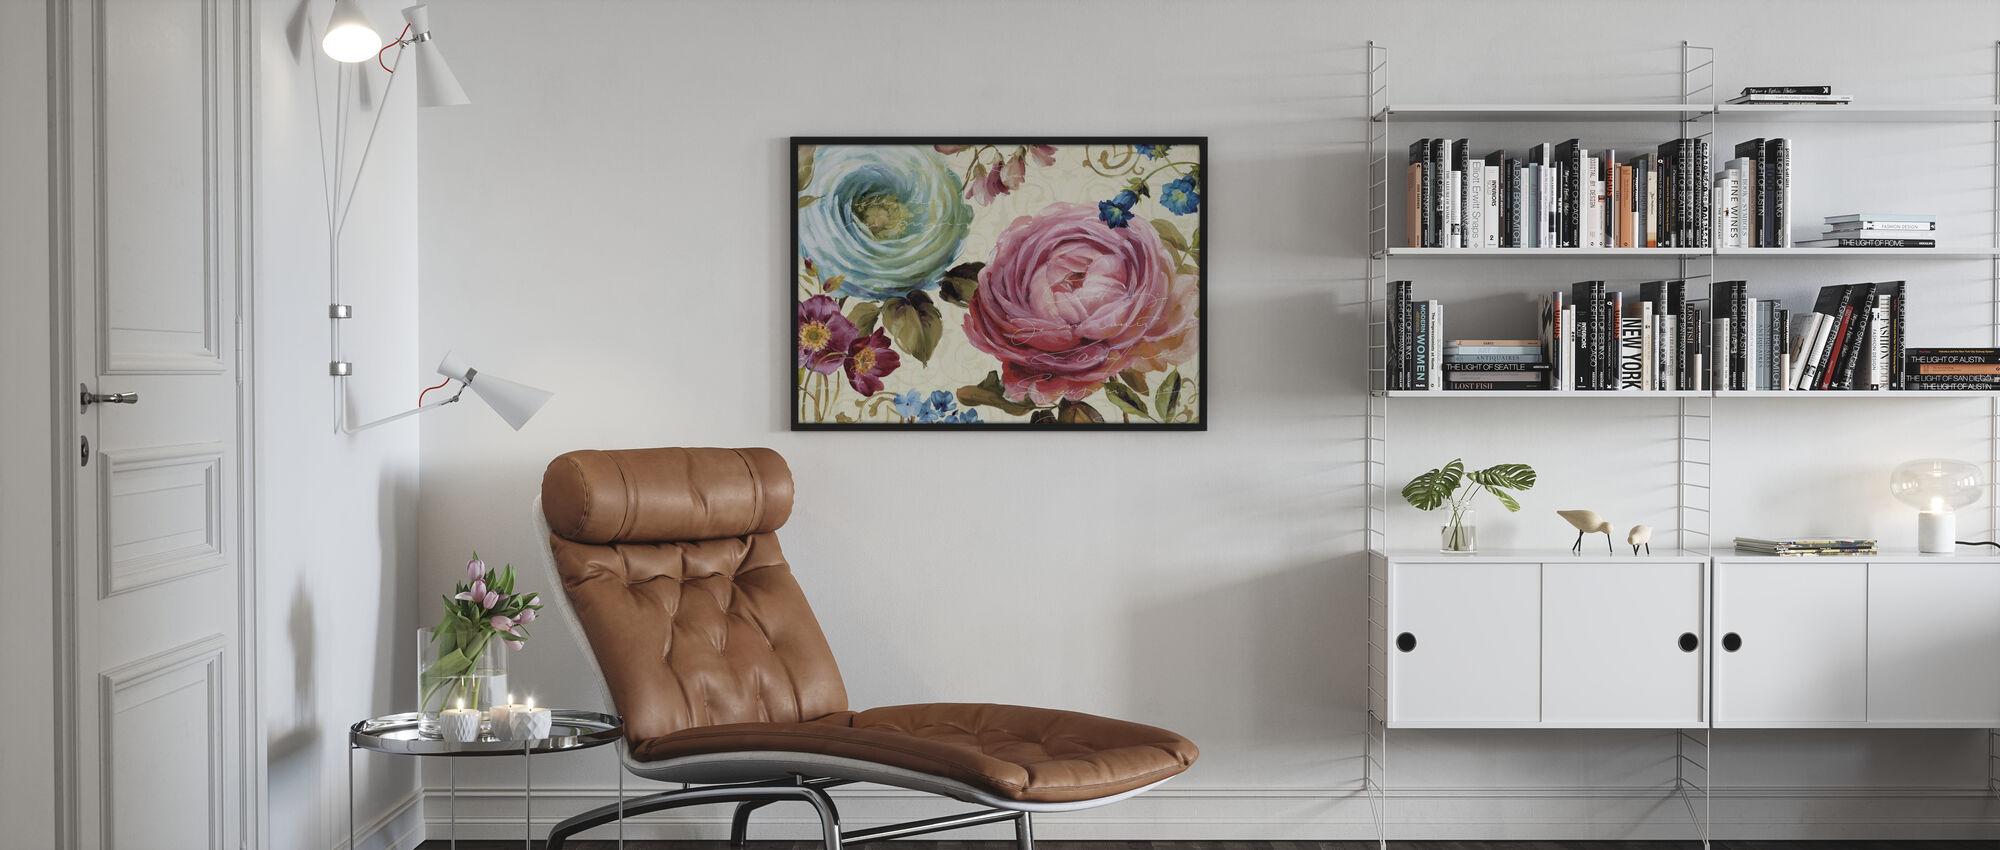 Dream Wins - Poster - Living Room